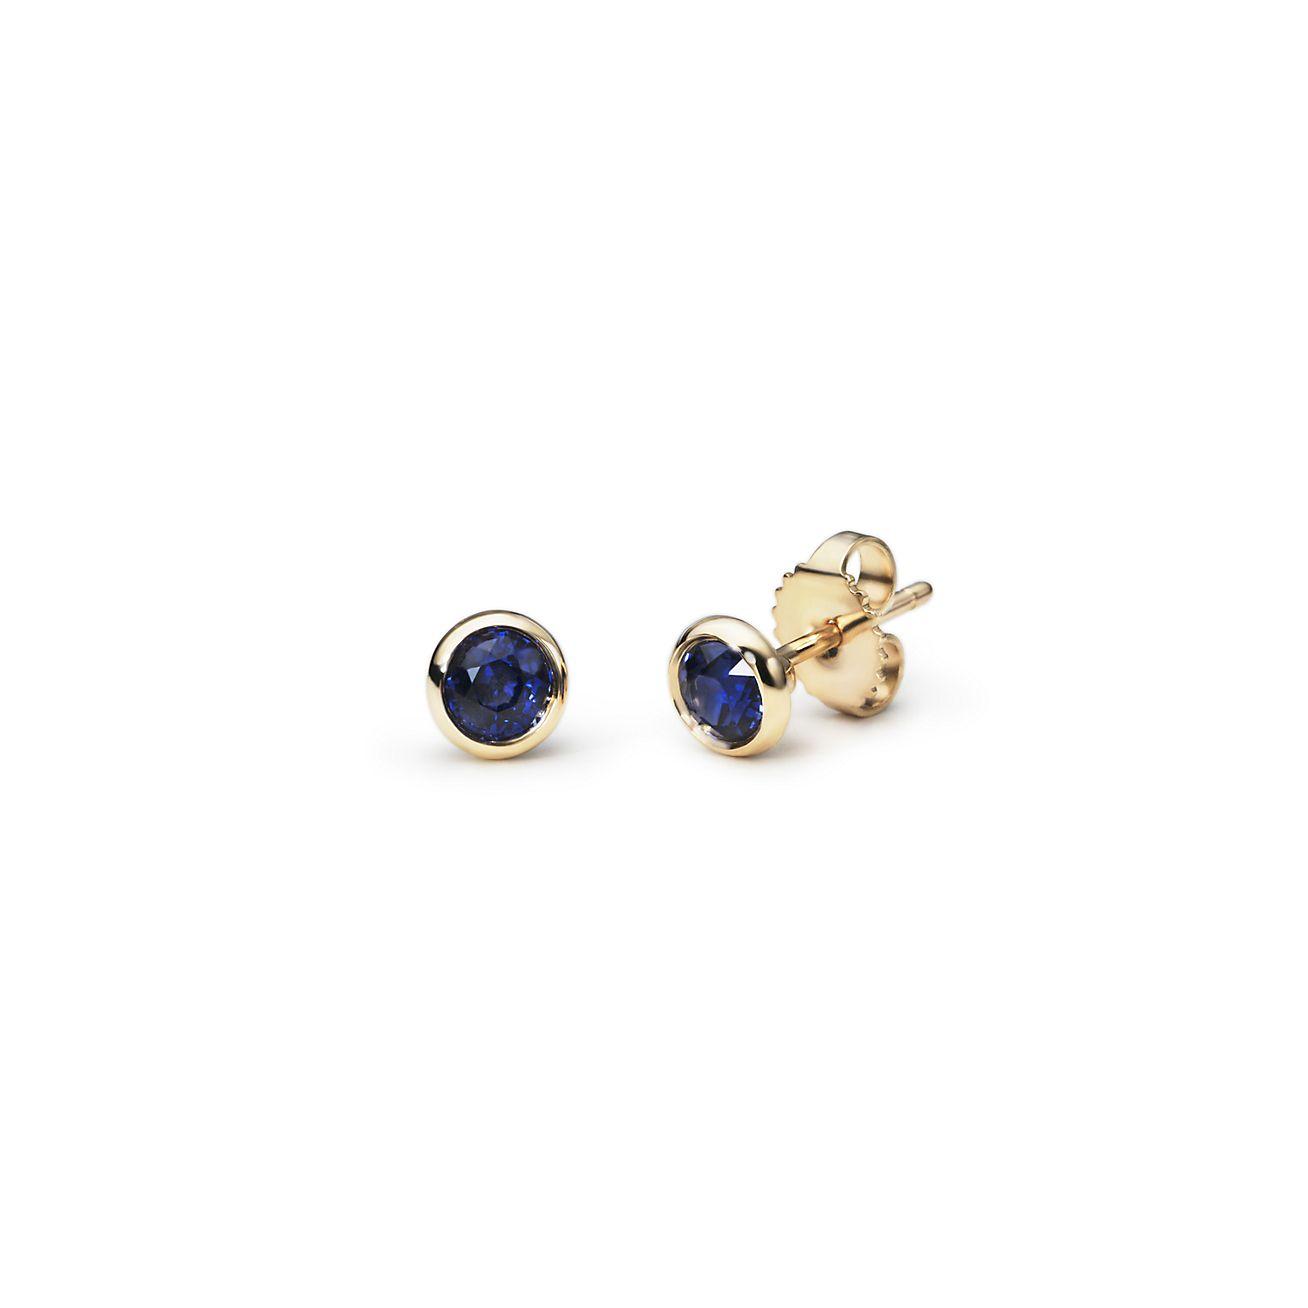 elsa peretti color by the yard earrings - Elsa Peretti Color By The Yard Ring